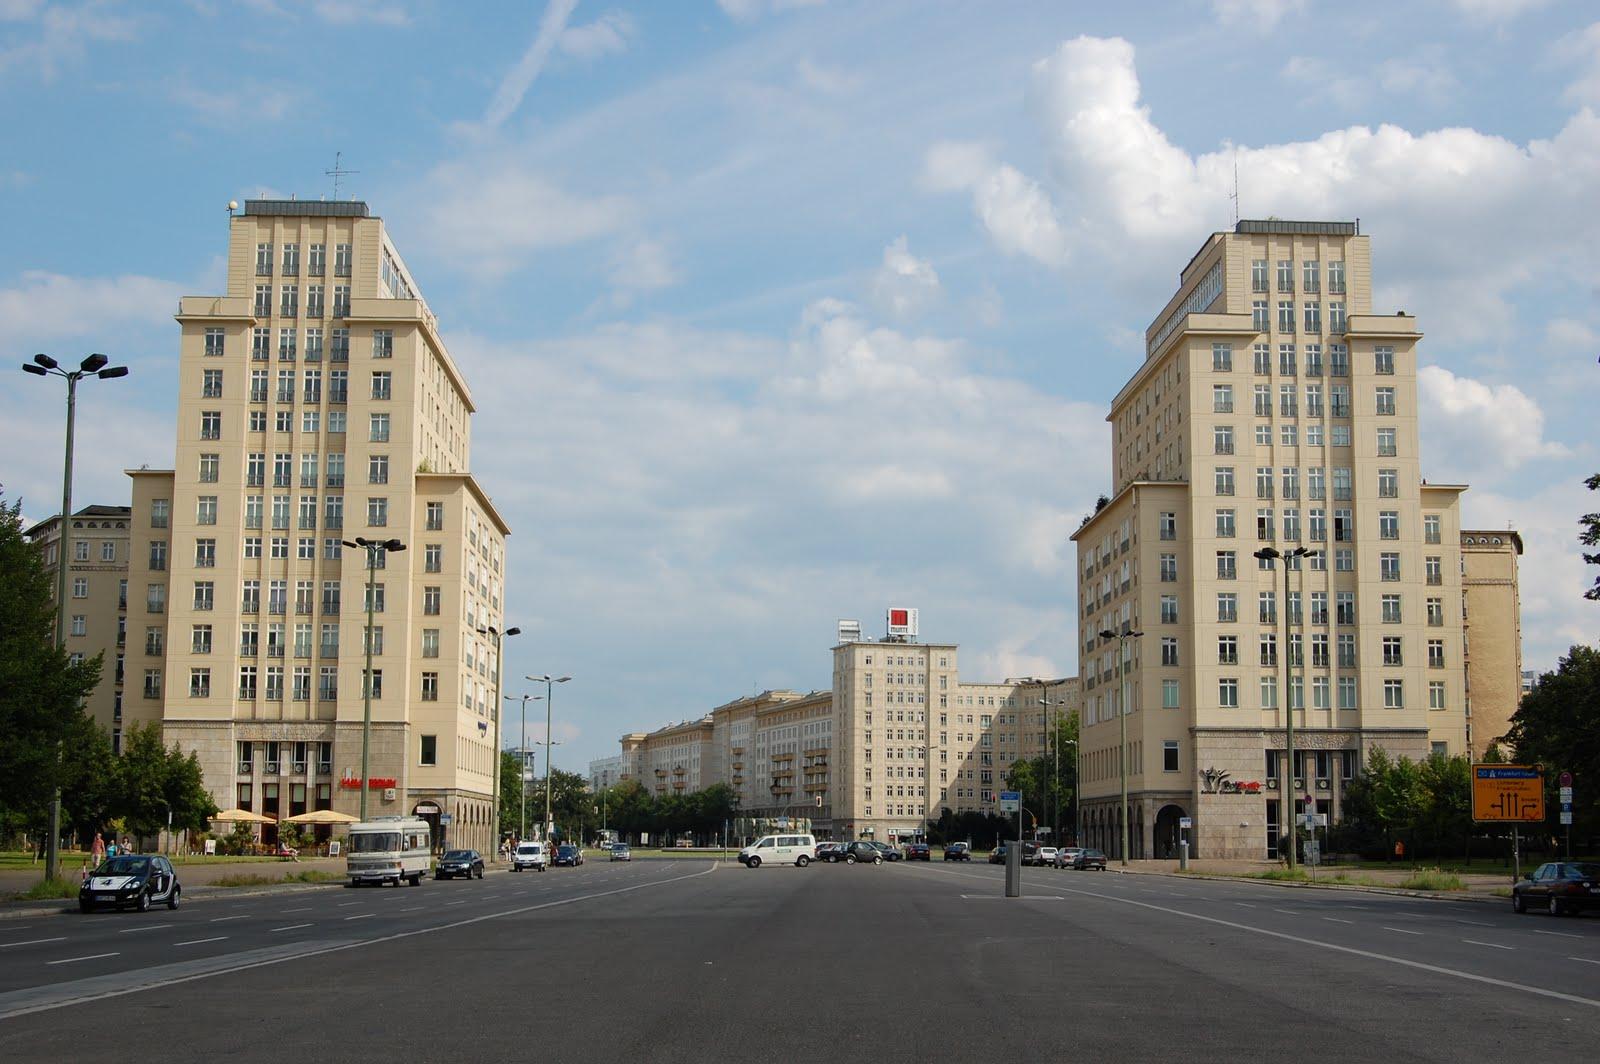 Berlin Frankfurter Allee Hotel